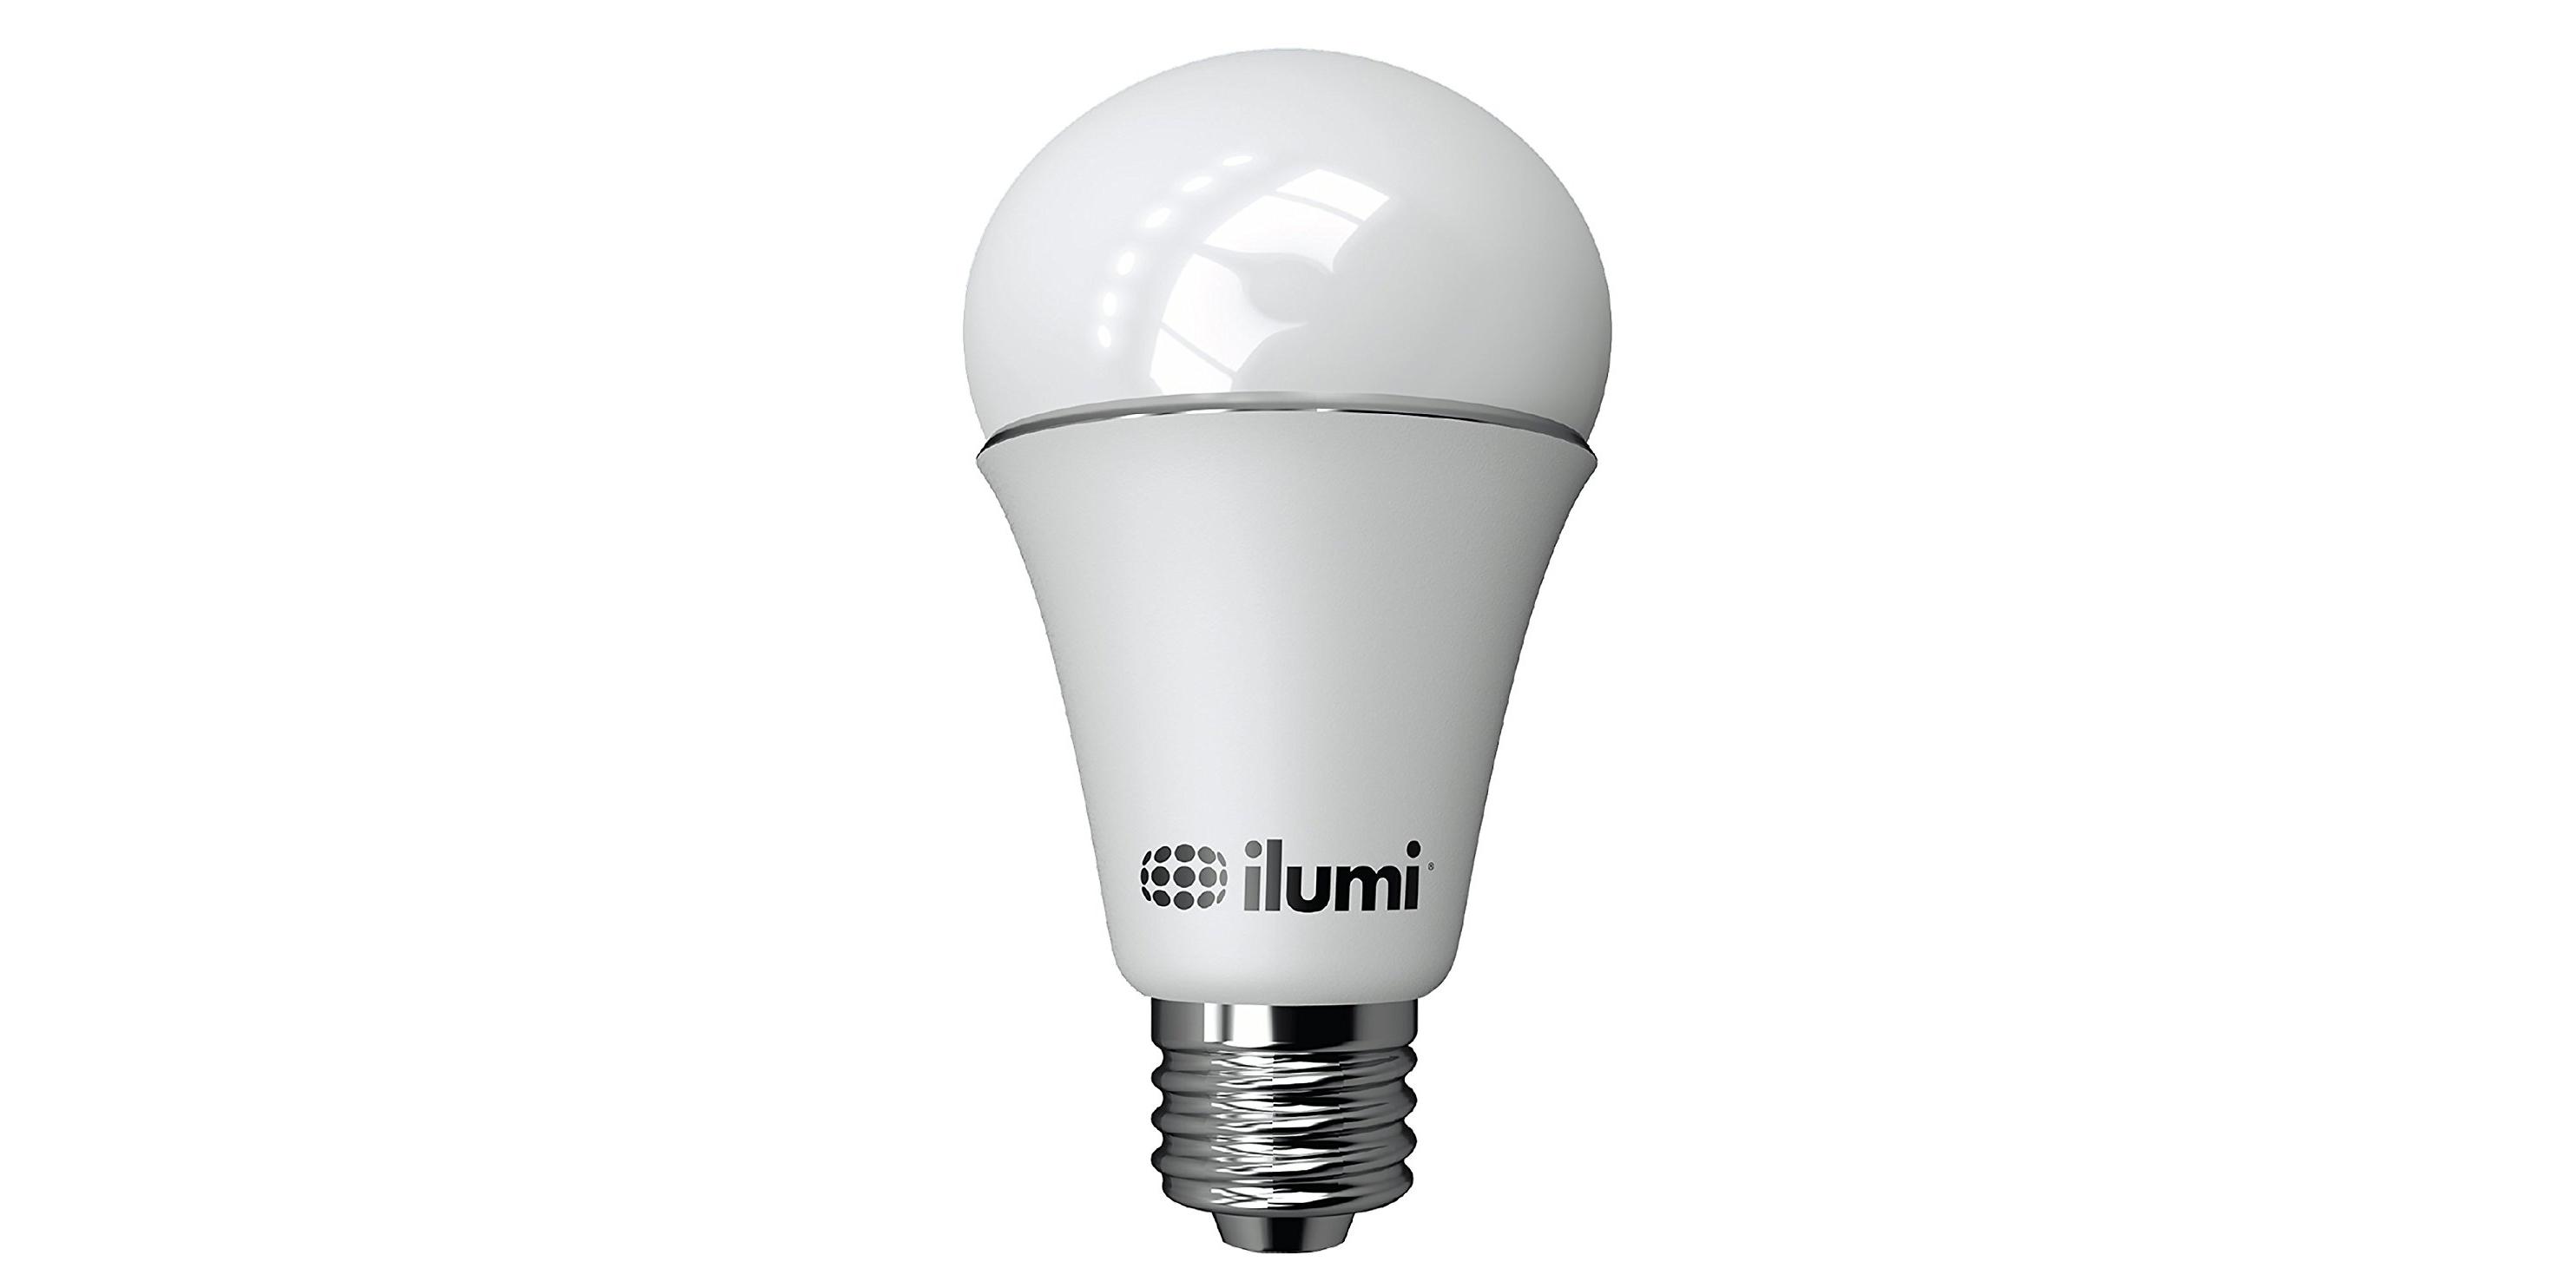 ilumi-led-light